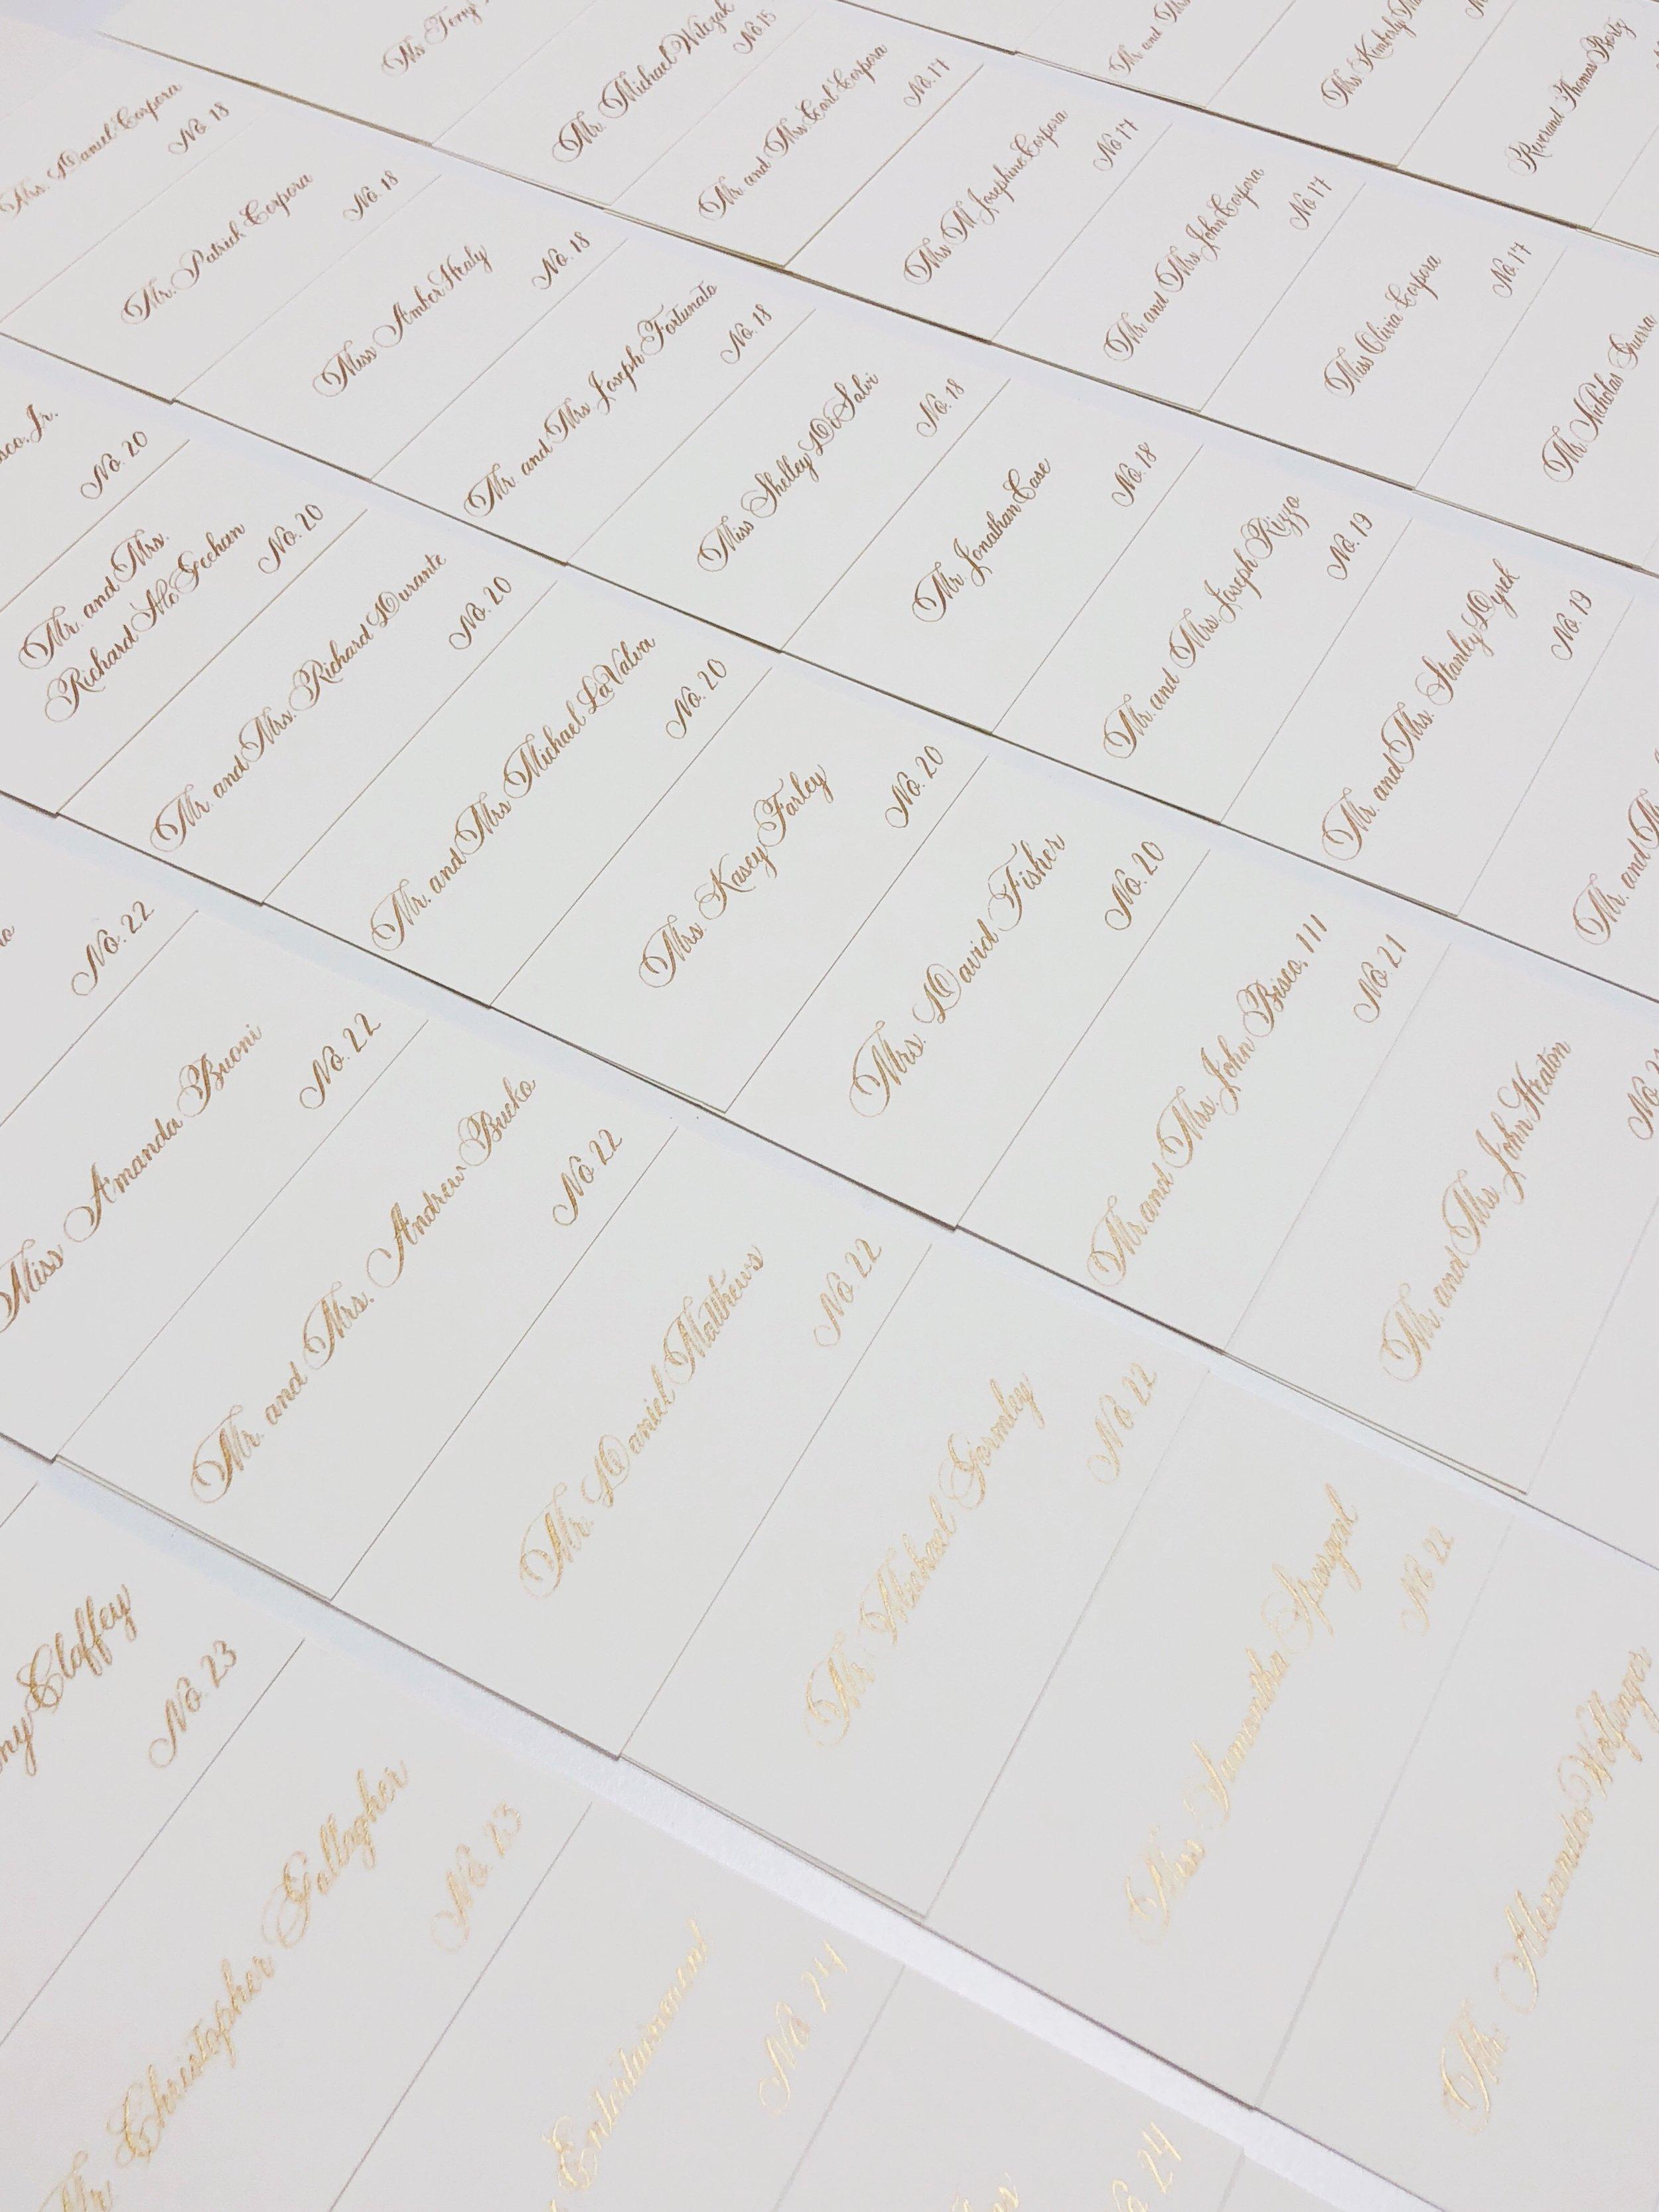 Central PA, York PA, JesSmith Designs, custom, wedding, invitations, bridal, Harrisburg, hanover, calligraphy, baltimore, wedding invitations, lancaster, gettysburg, 08-26 11.12.10.jpg